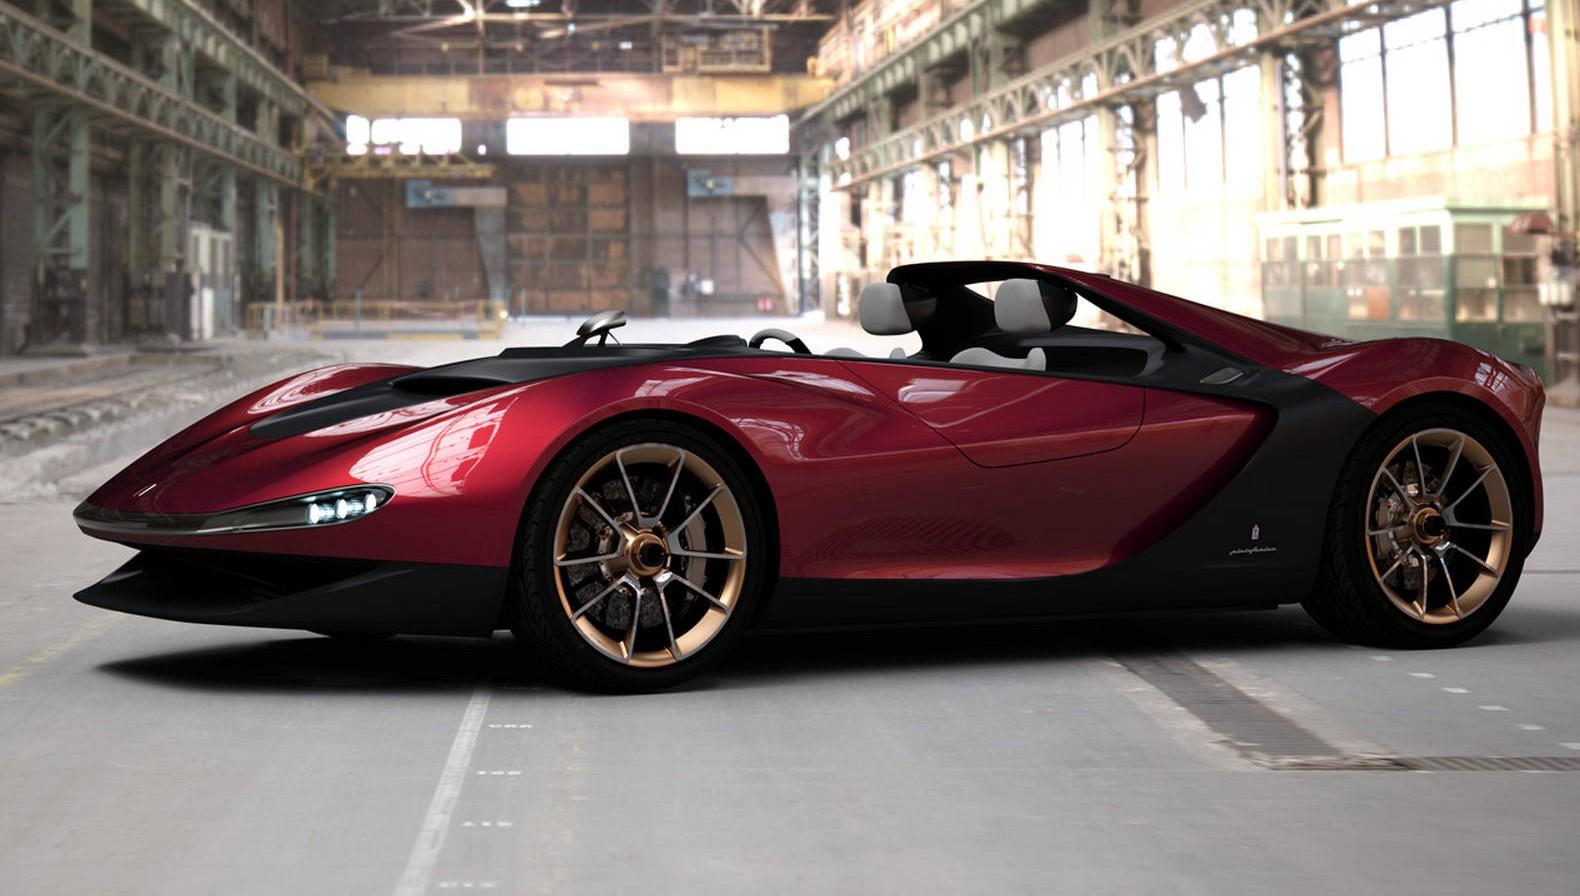 most expensive cars of 2018: Ferrari Pininfarina Sergio